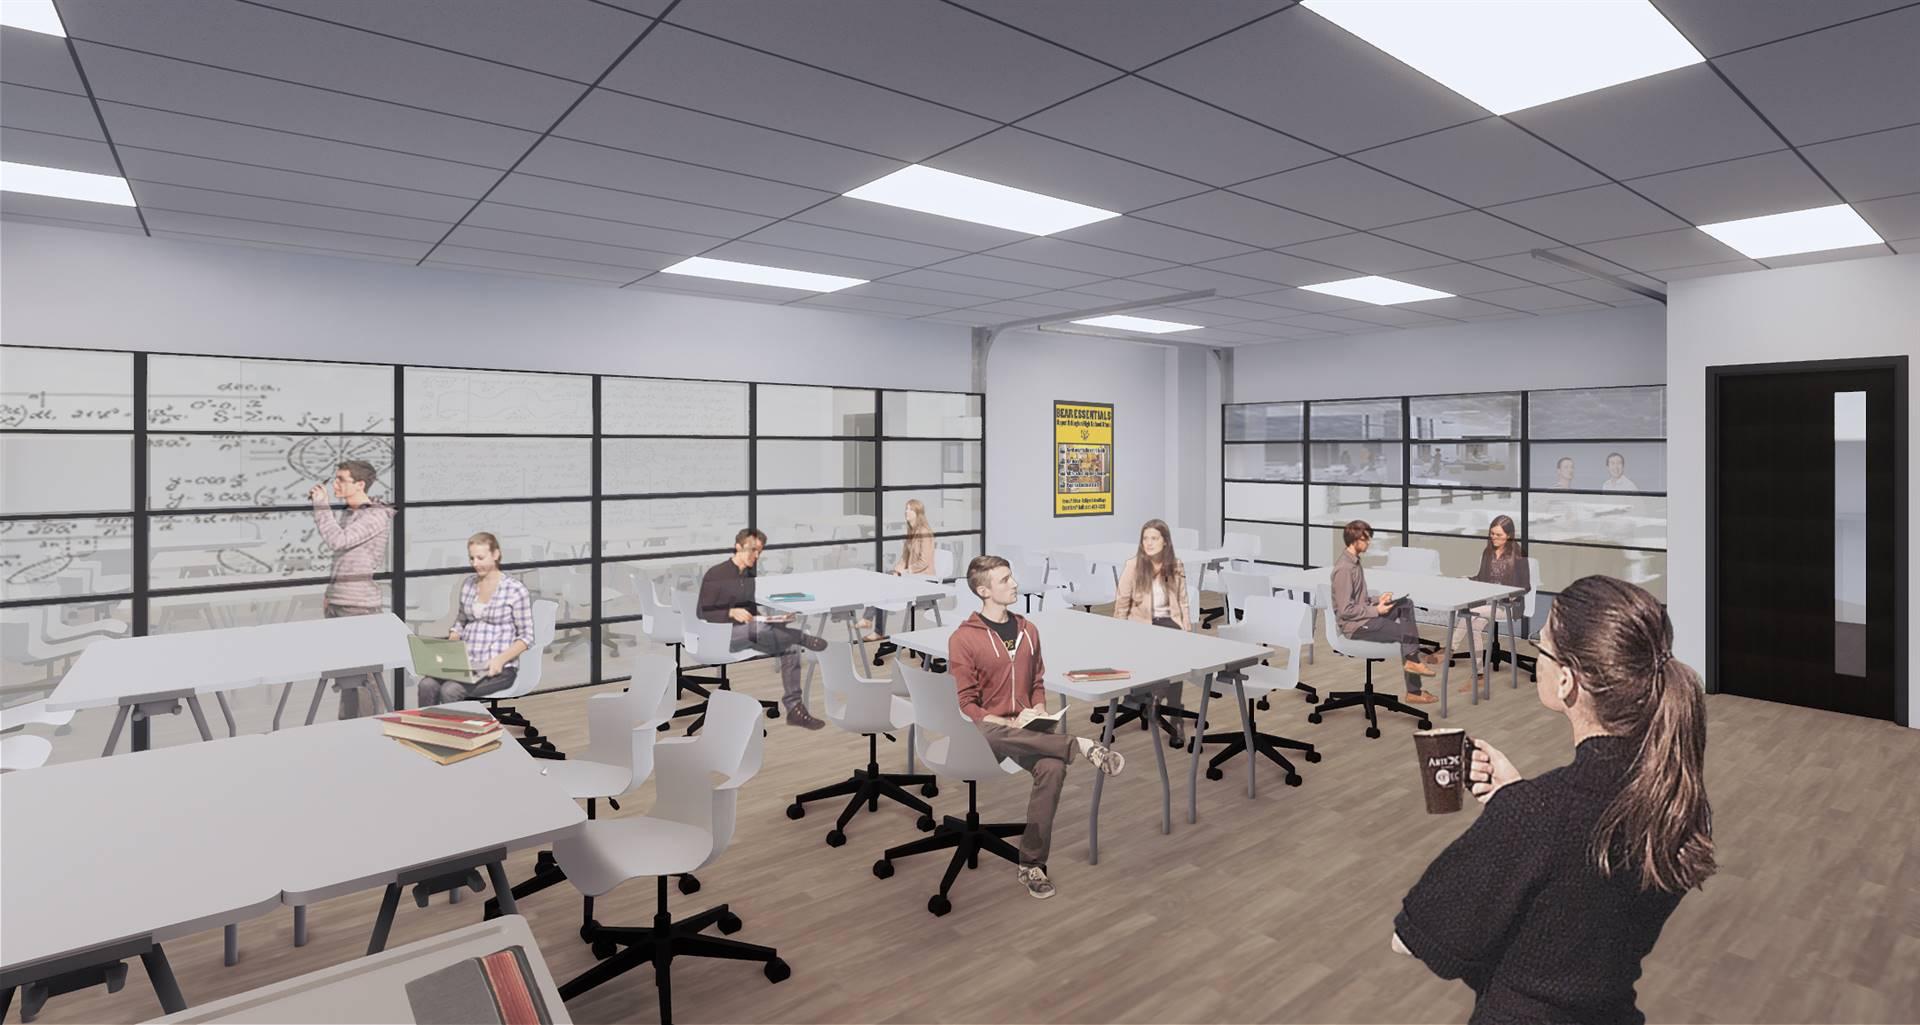 A rendering of a studio classroom